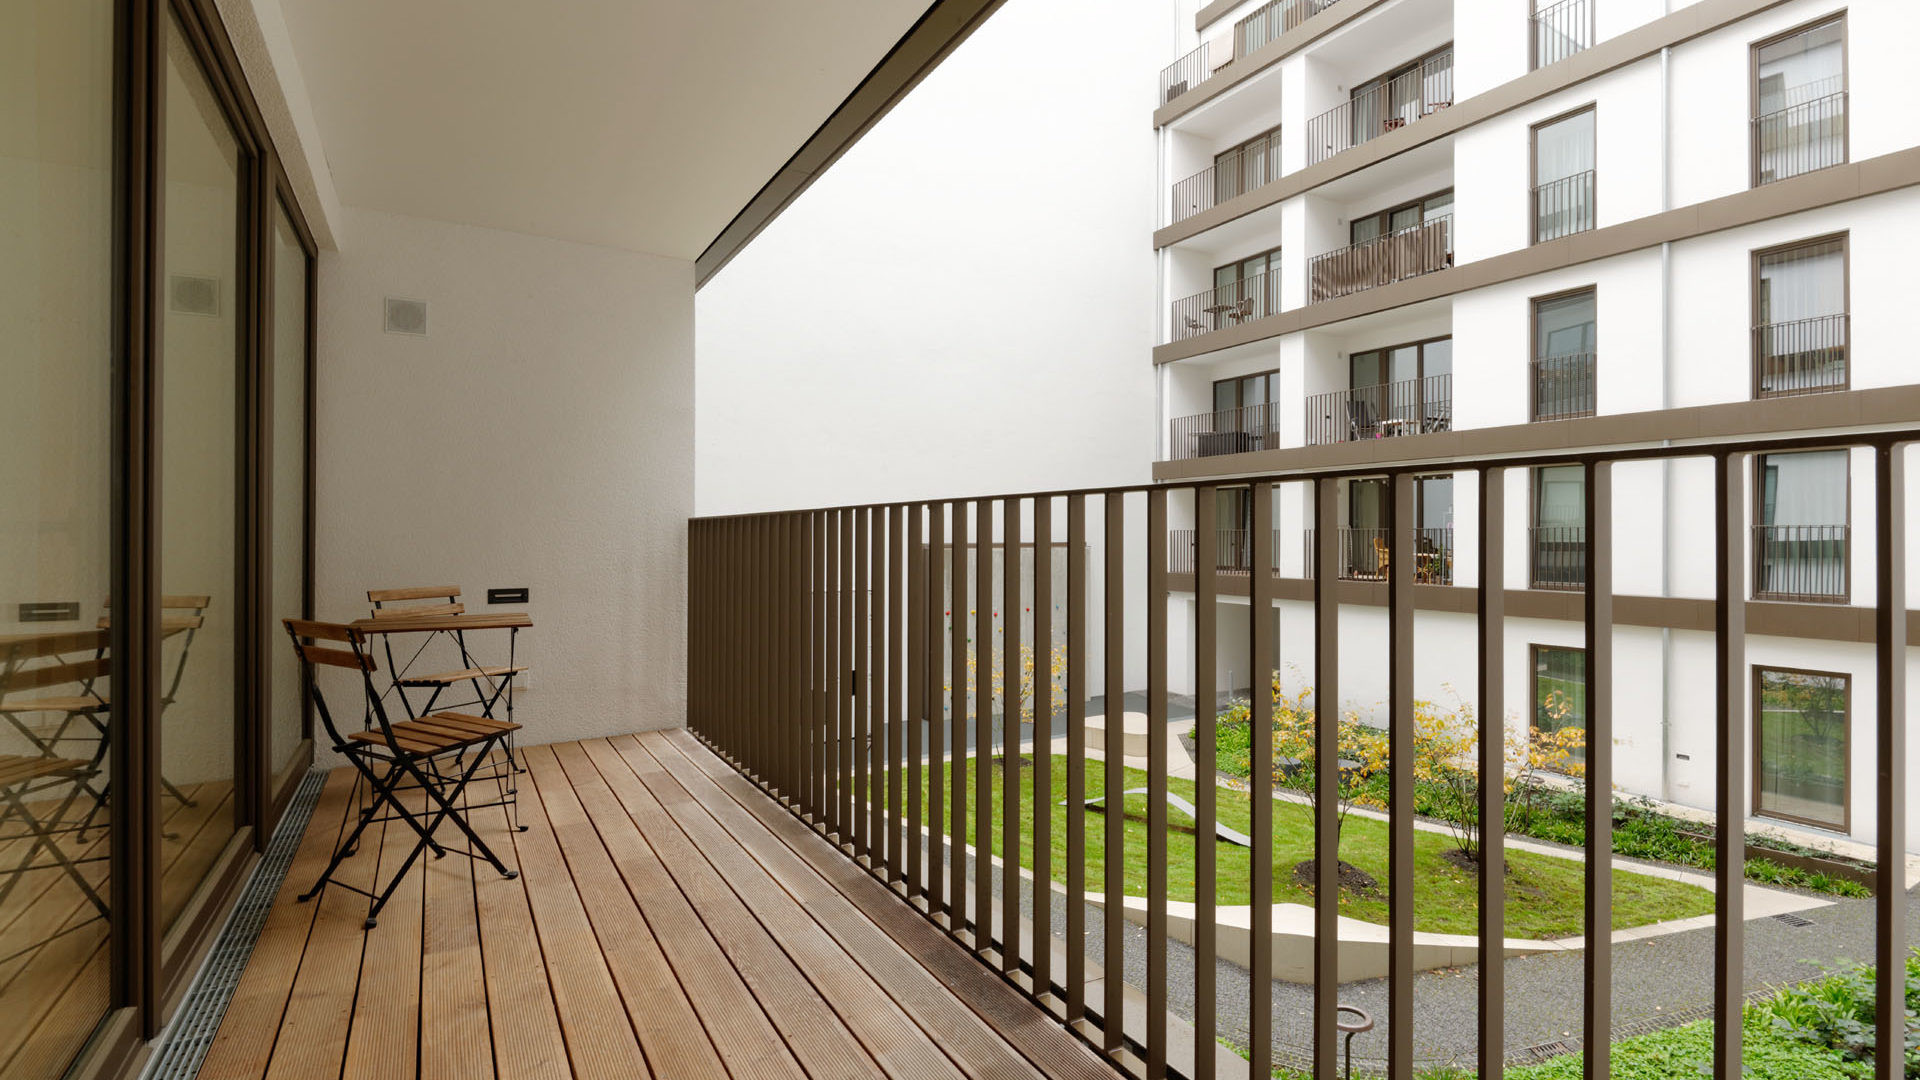 Wohnung Berlin Mieten  2 Zimmer Wohnung Berlin Prenzlauer Berg Mieten Designer 3